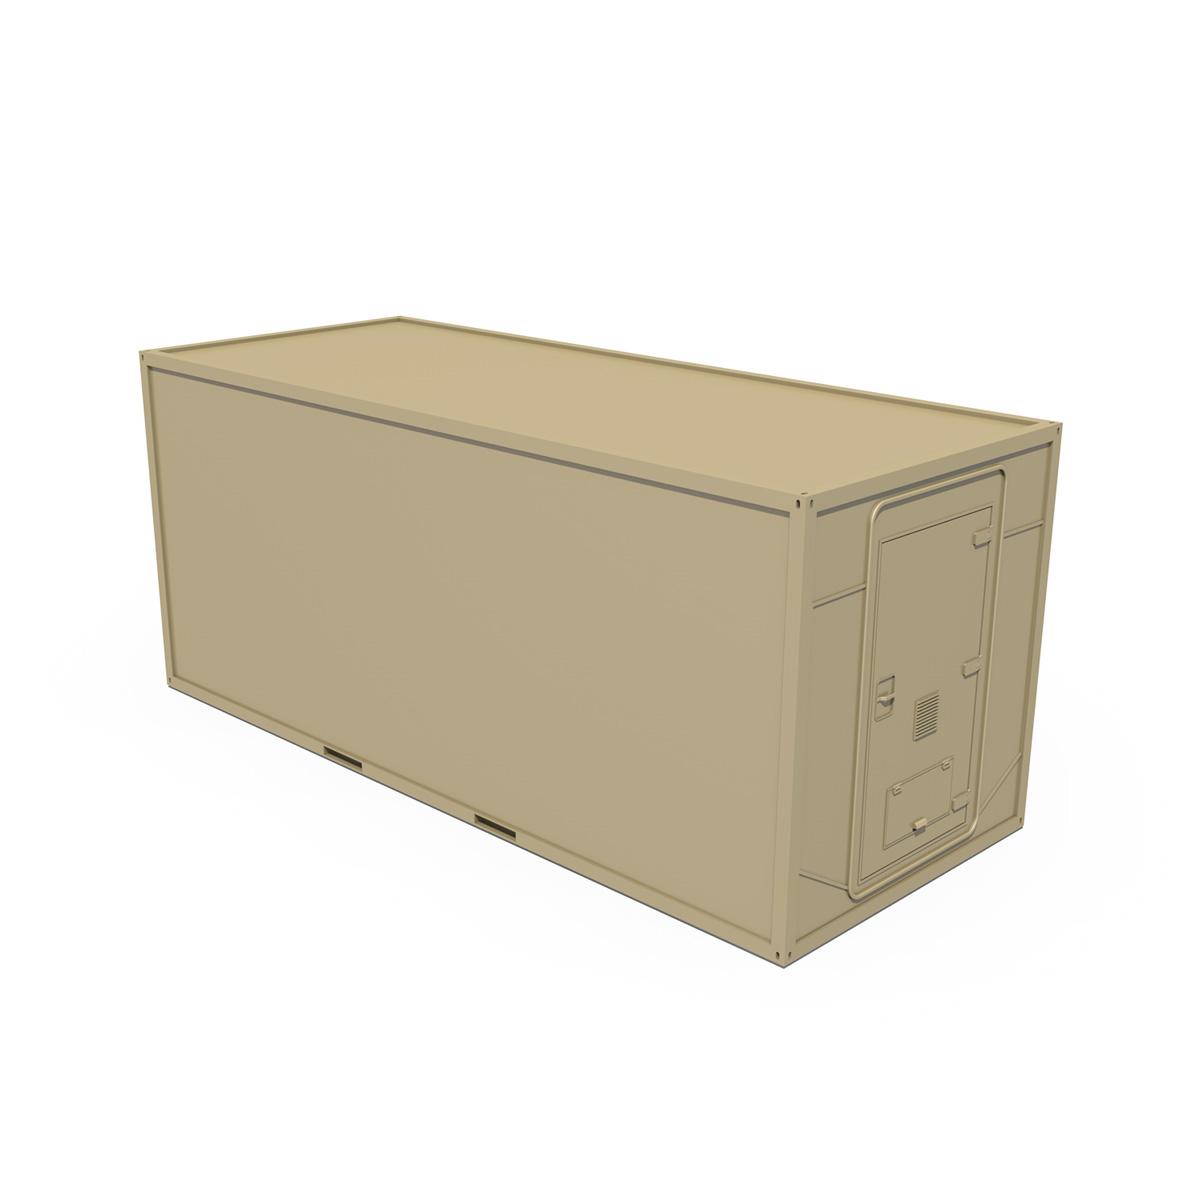 20ft ofis konteyner versiyası iki 3d model 3ds fbx c4d lwo obj 252277